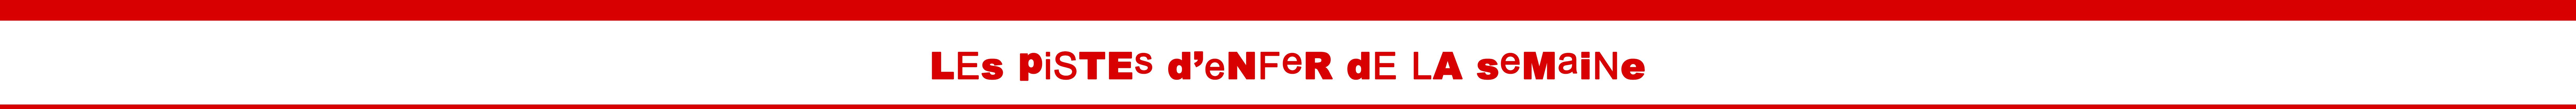 http://labomedia.a.l.f.unblog.fr/files/2020/12/poatlf-pistes-denfer-07.png